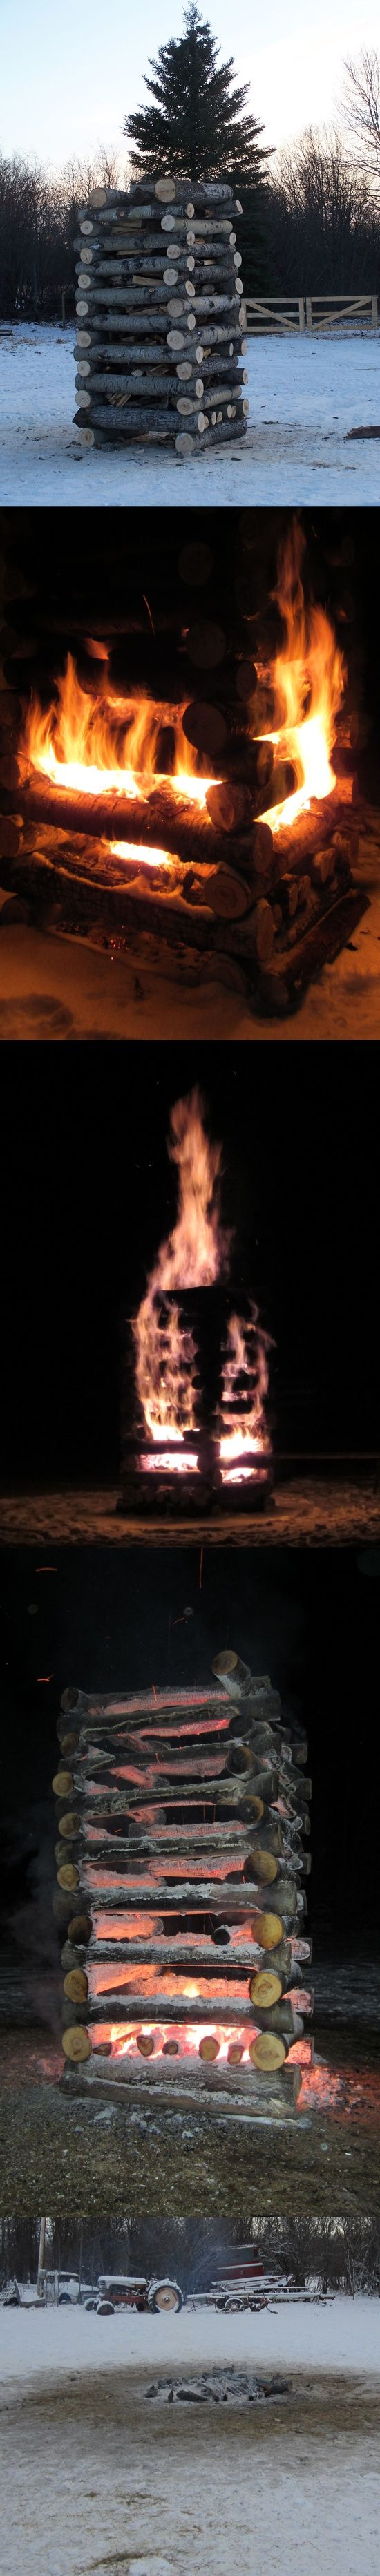 How To Make A Huge Bonfire » The Homestead Survival